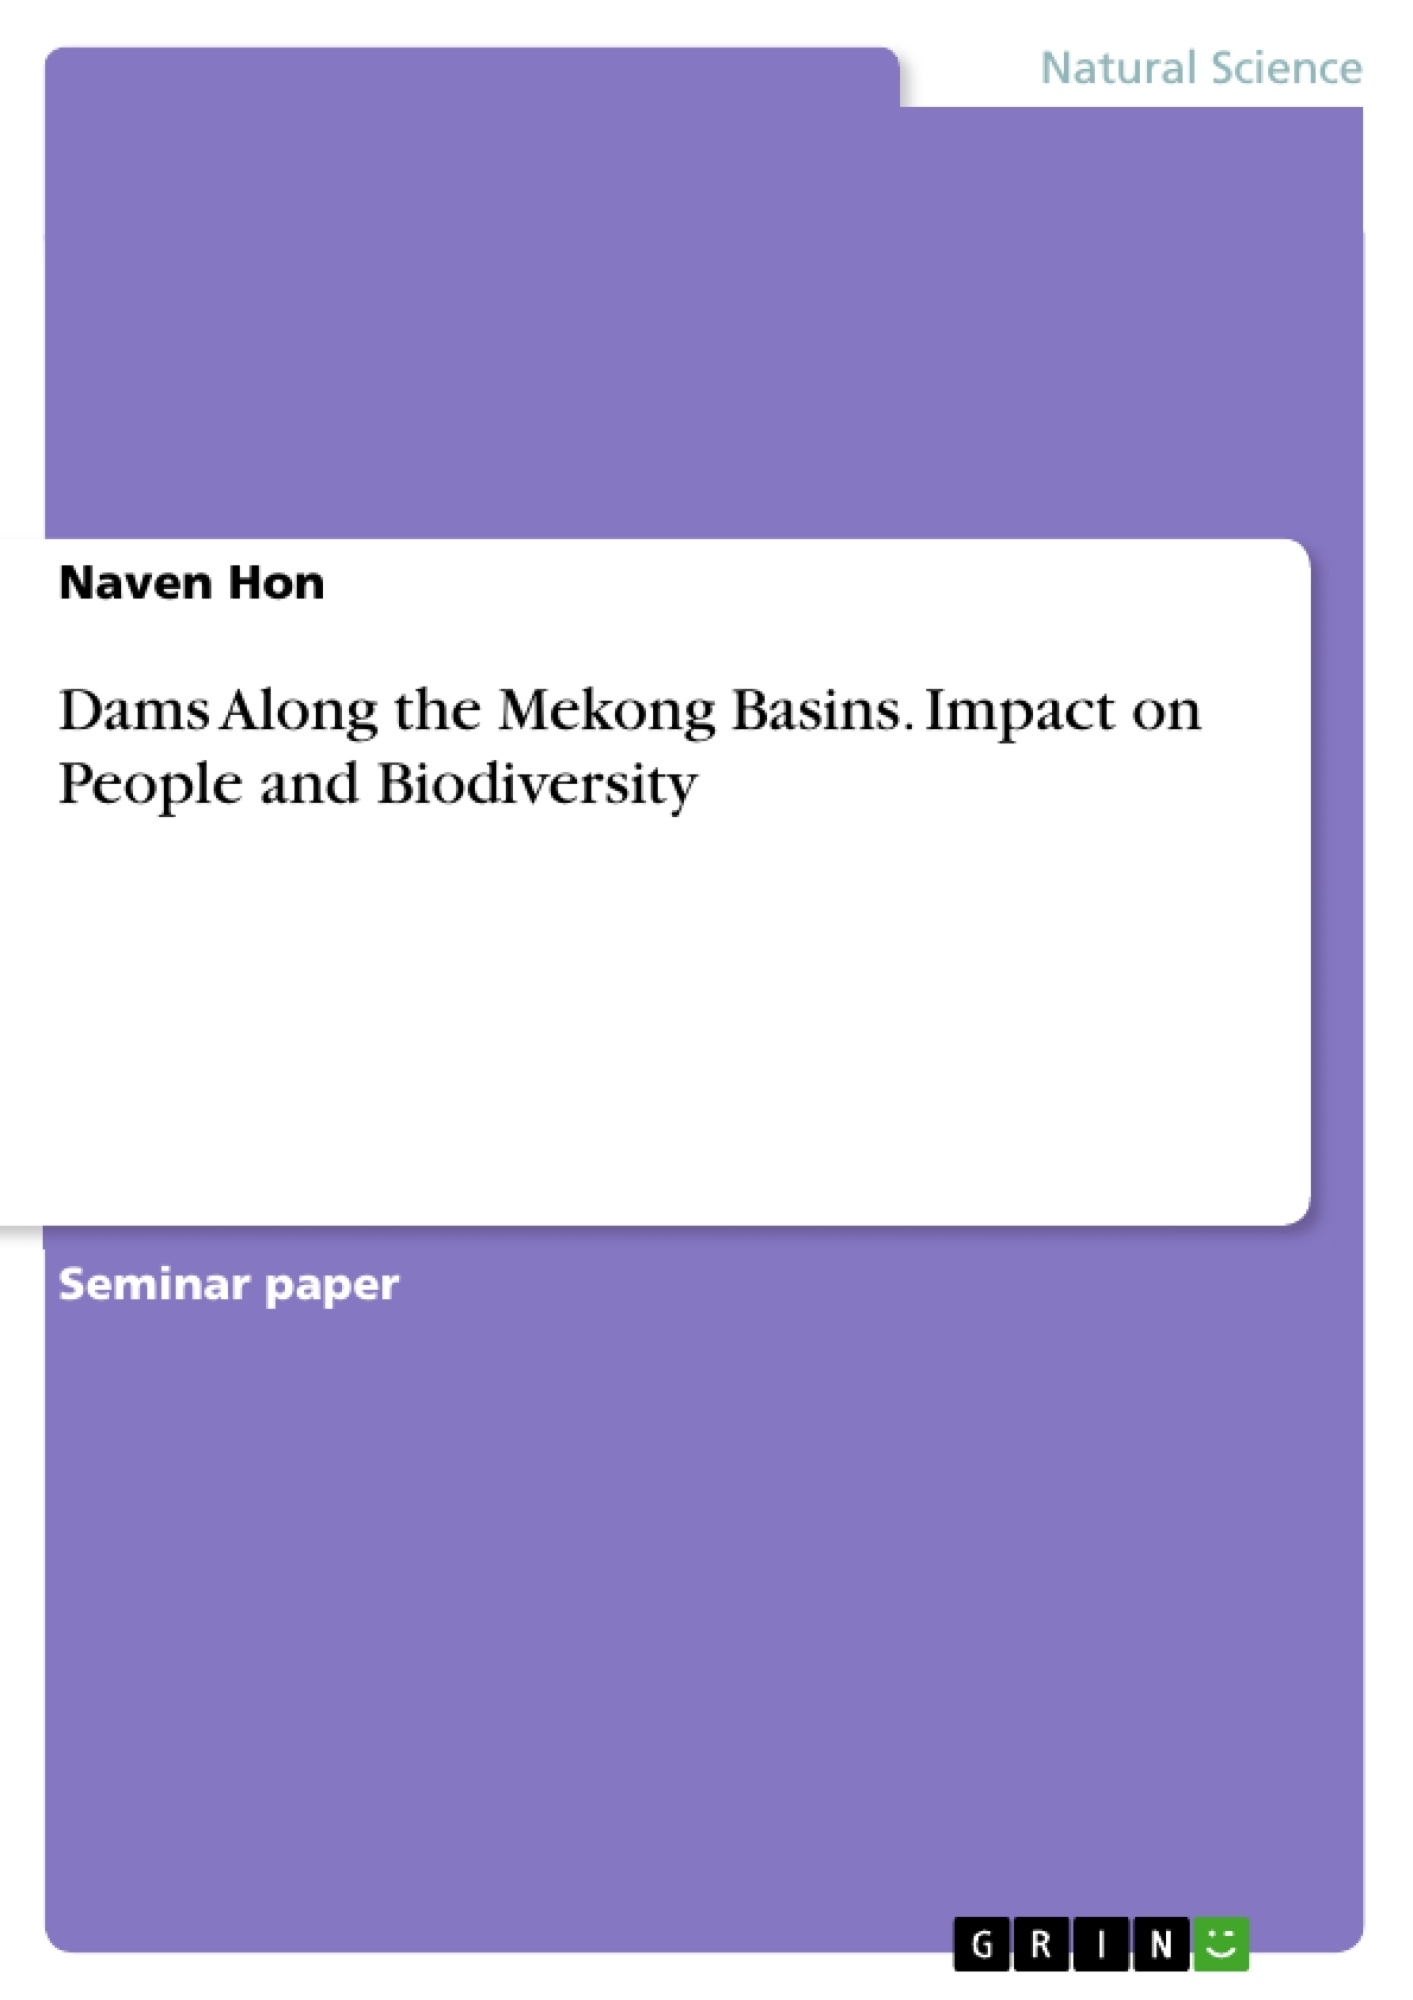 Title: Dams Along the Mekong Basins. Impact on People and Biodiversity